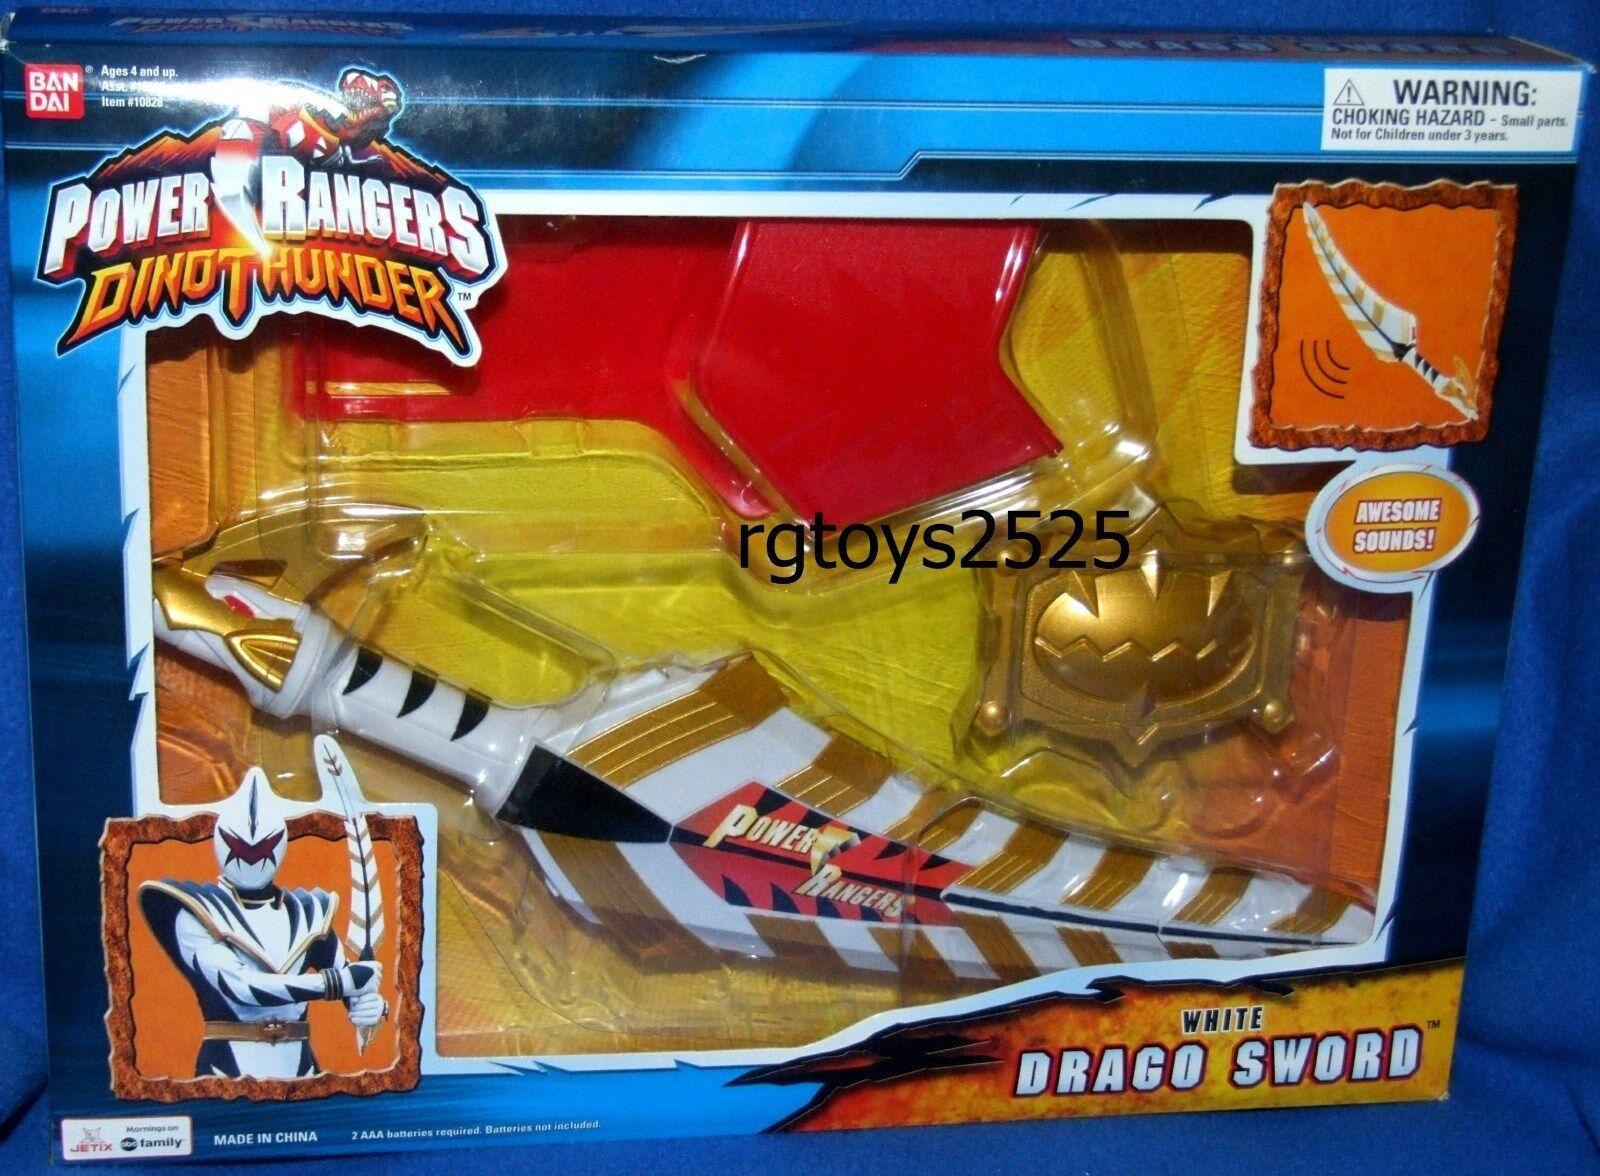 Power Rangers Dino Thunder Electronic sound Weiß Drago Sword Sword Sword New Factory Seal b1be8b